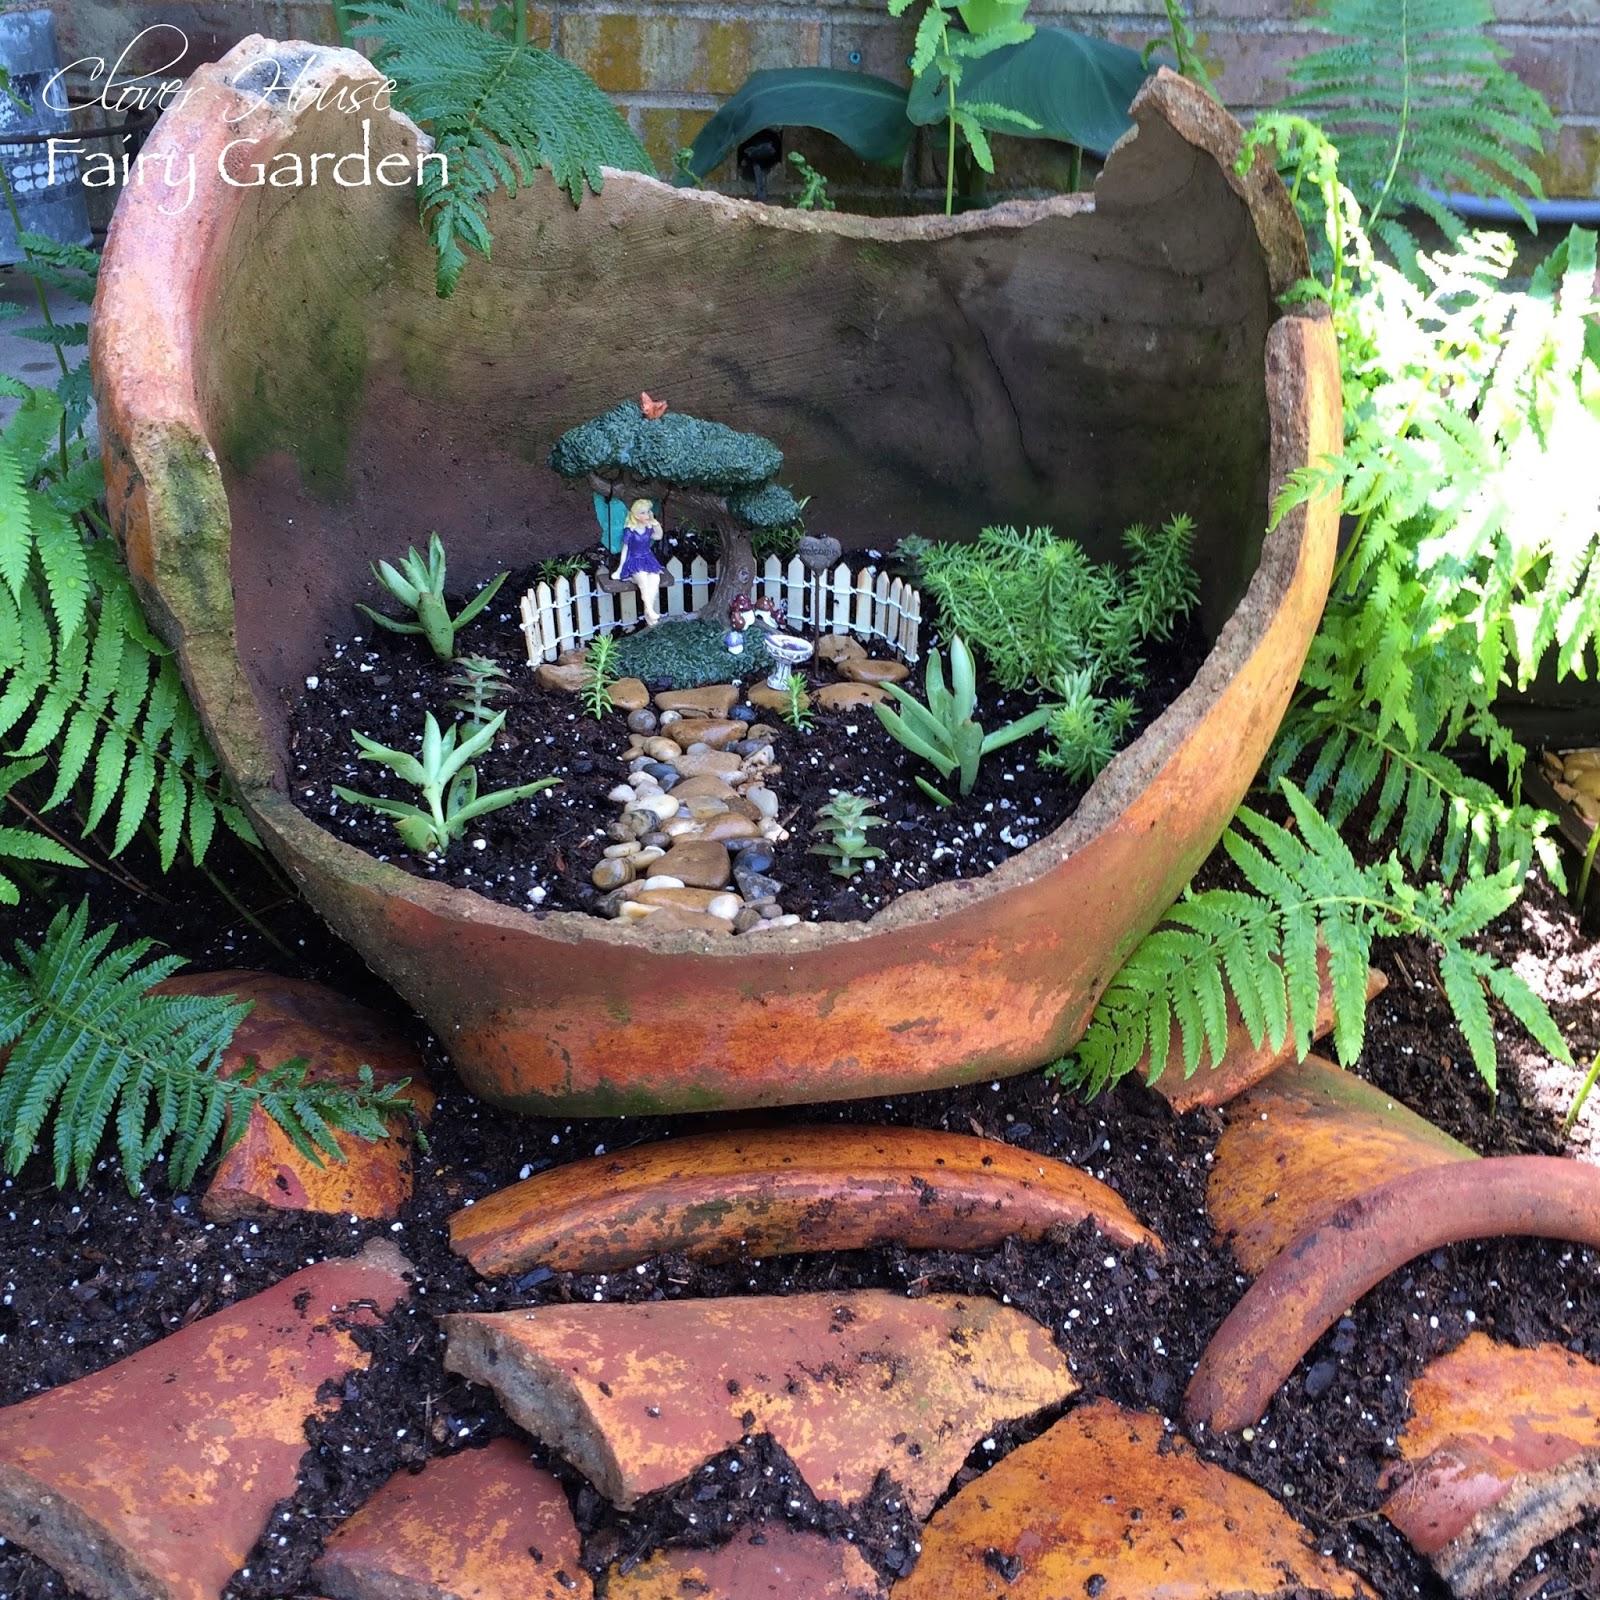 Clover House: How To Create A Recycled Fairy Garden